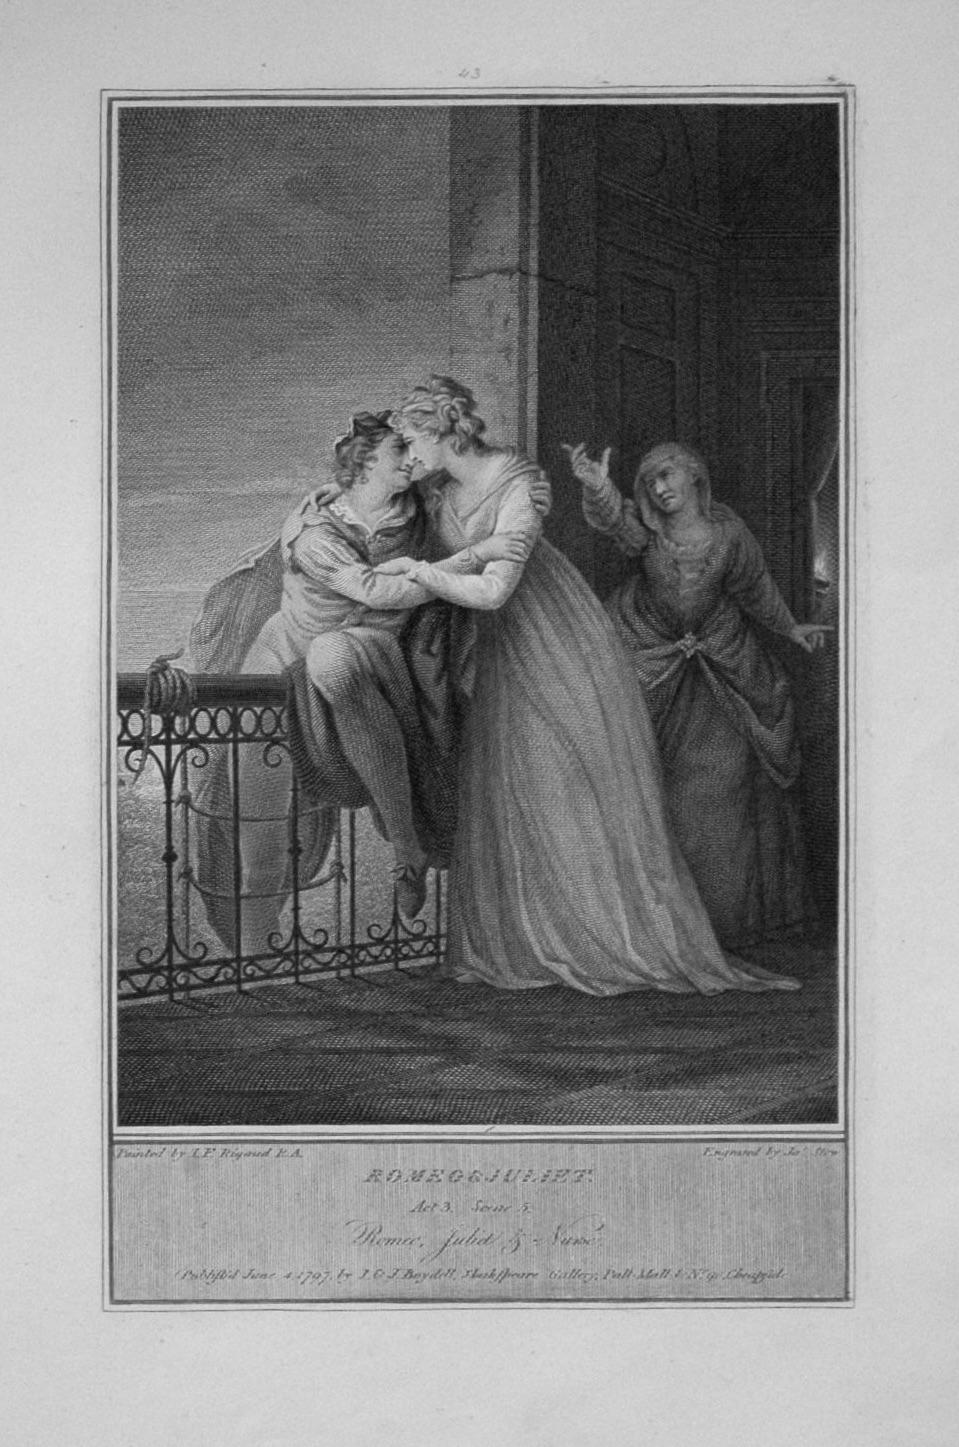 Romeo & Juliet. Act 3. Scene 5.